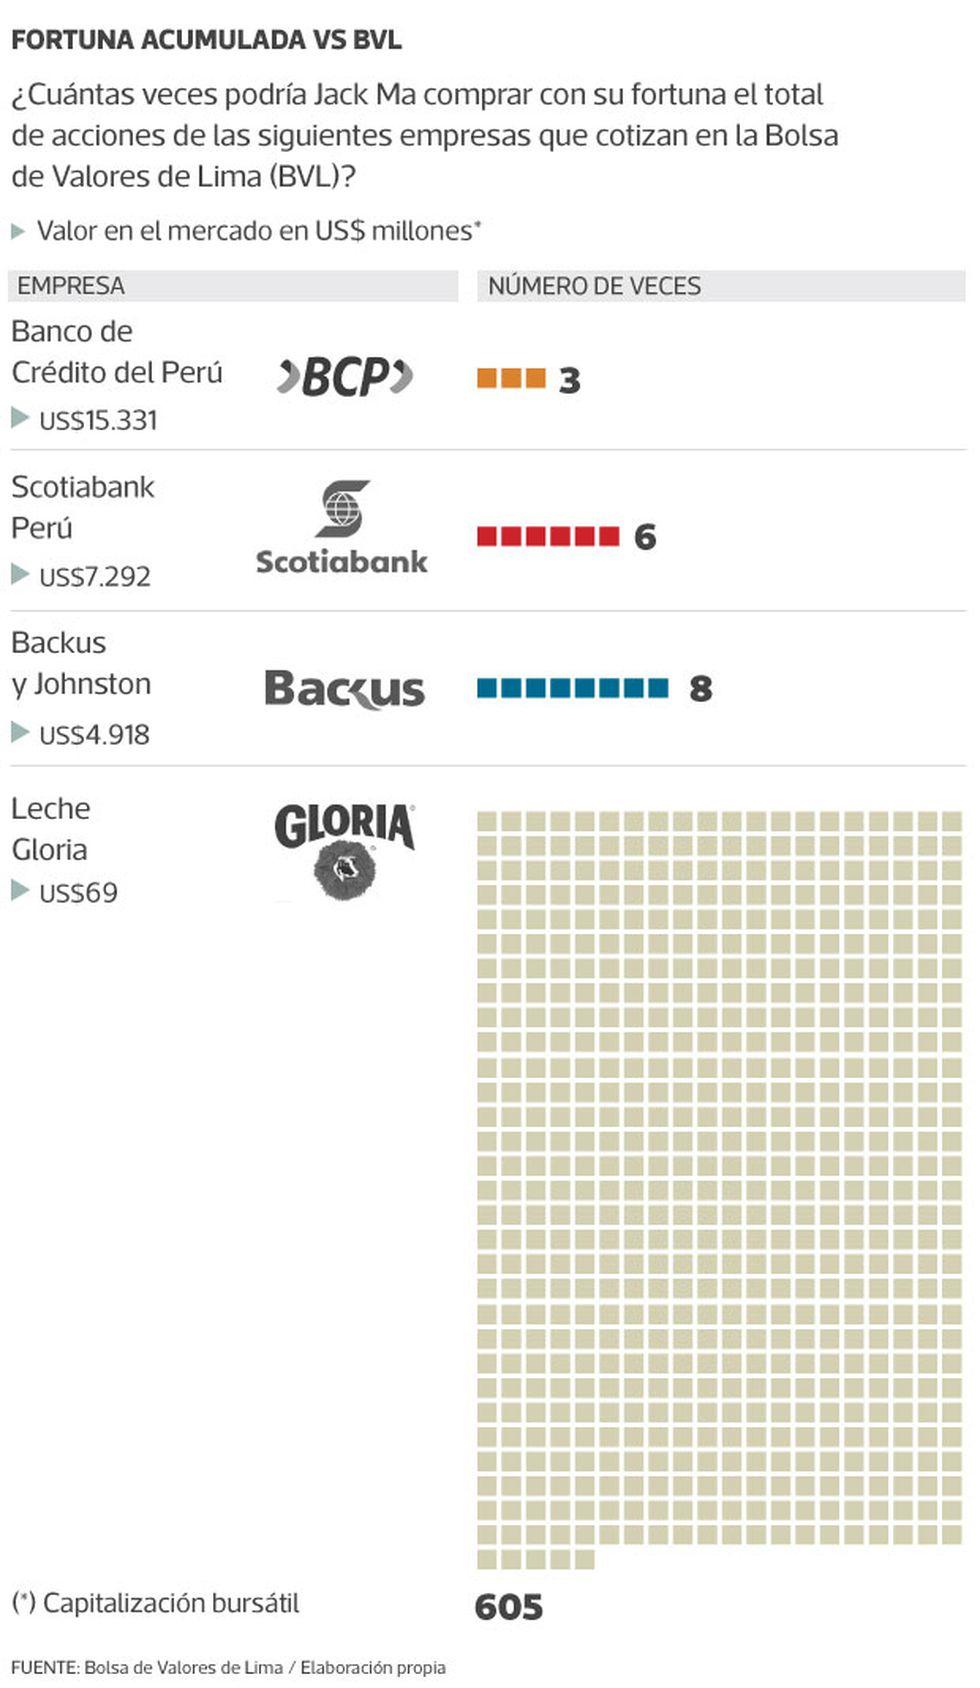 Fortuna acumulada vs. Bolsa de Valores de Lima (BVL)